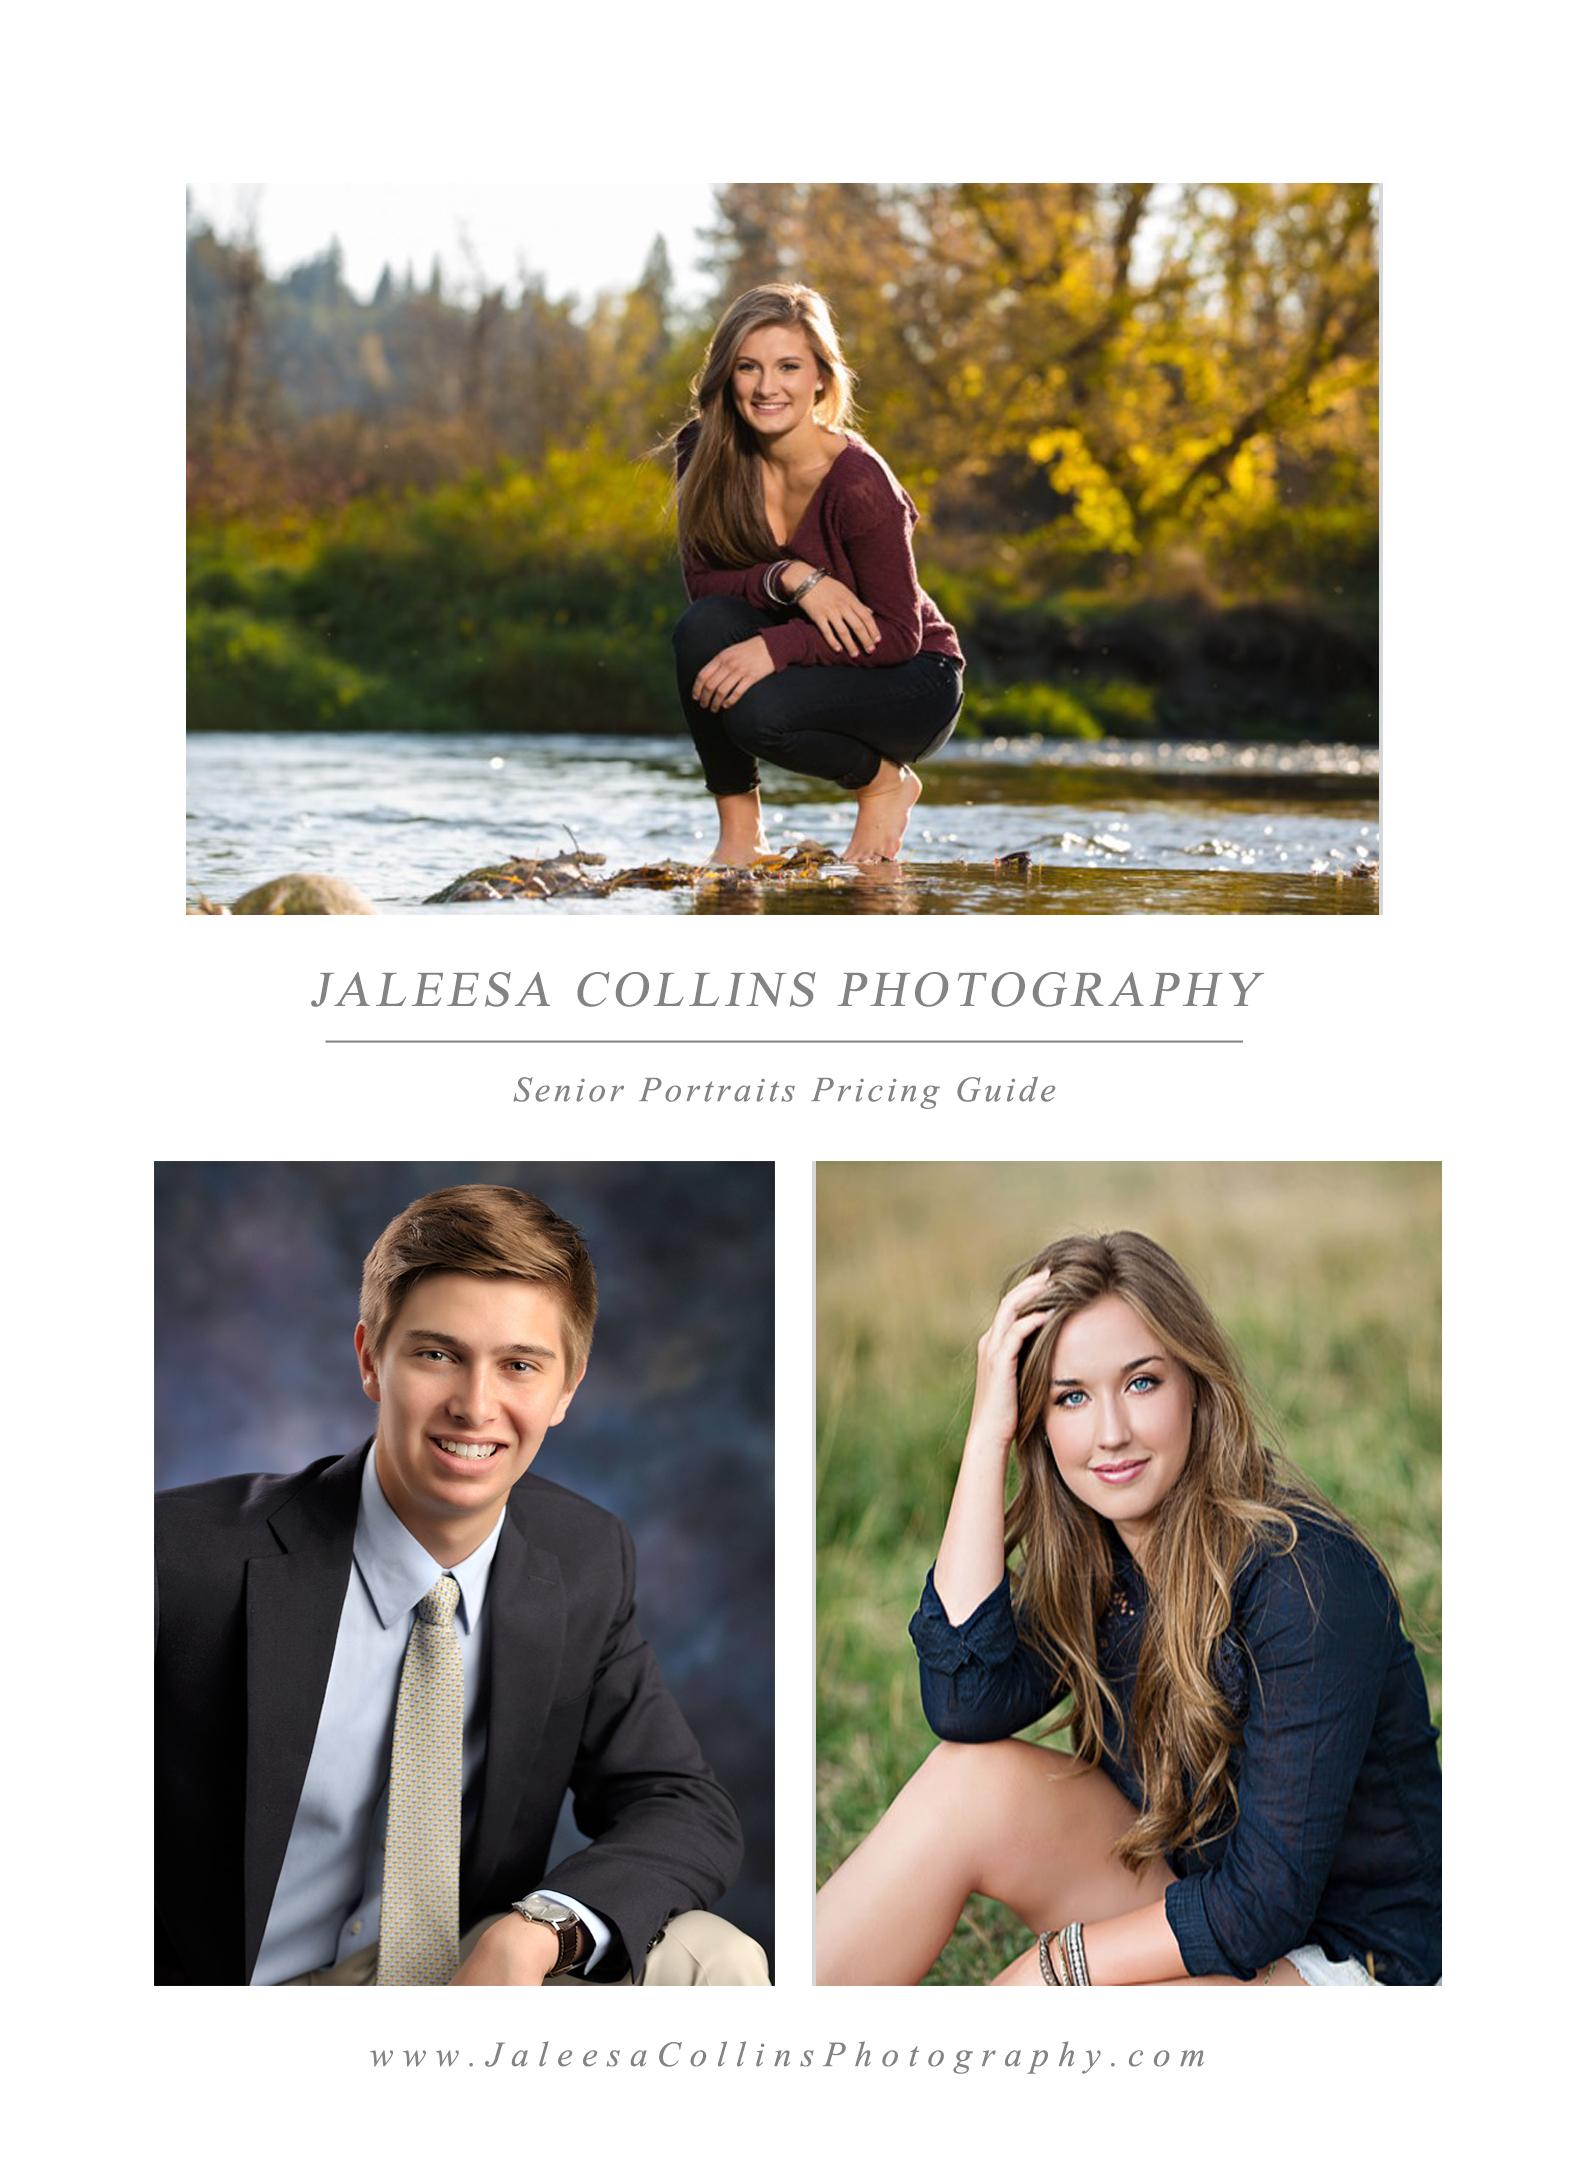 Jaleesa Collins Photography Senior Portraits Pricing Guide